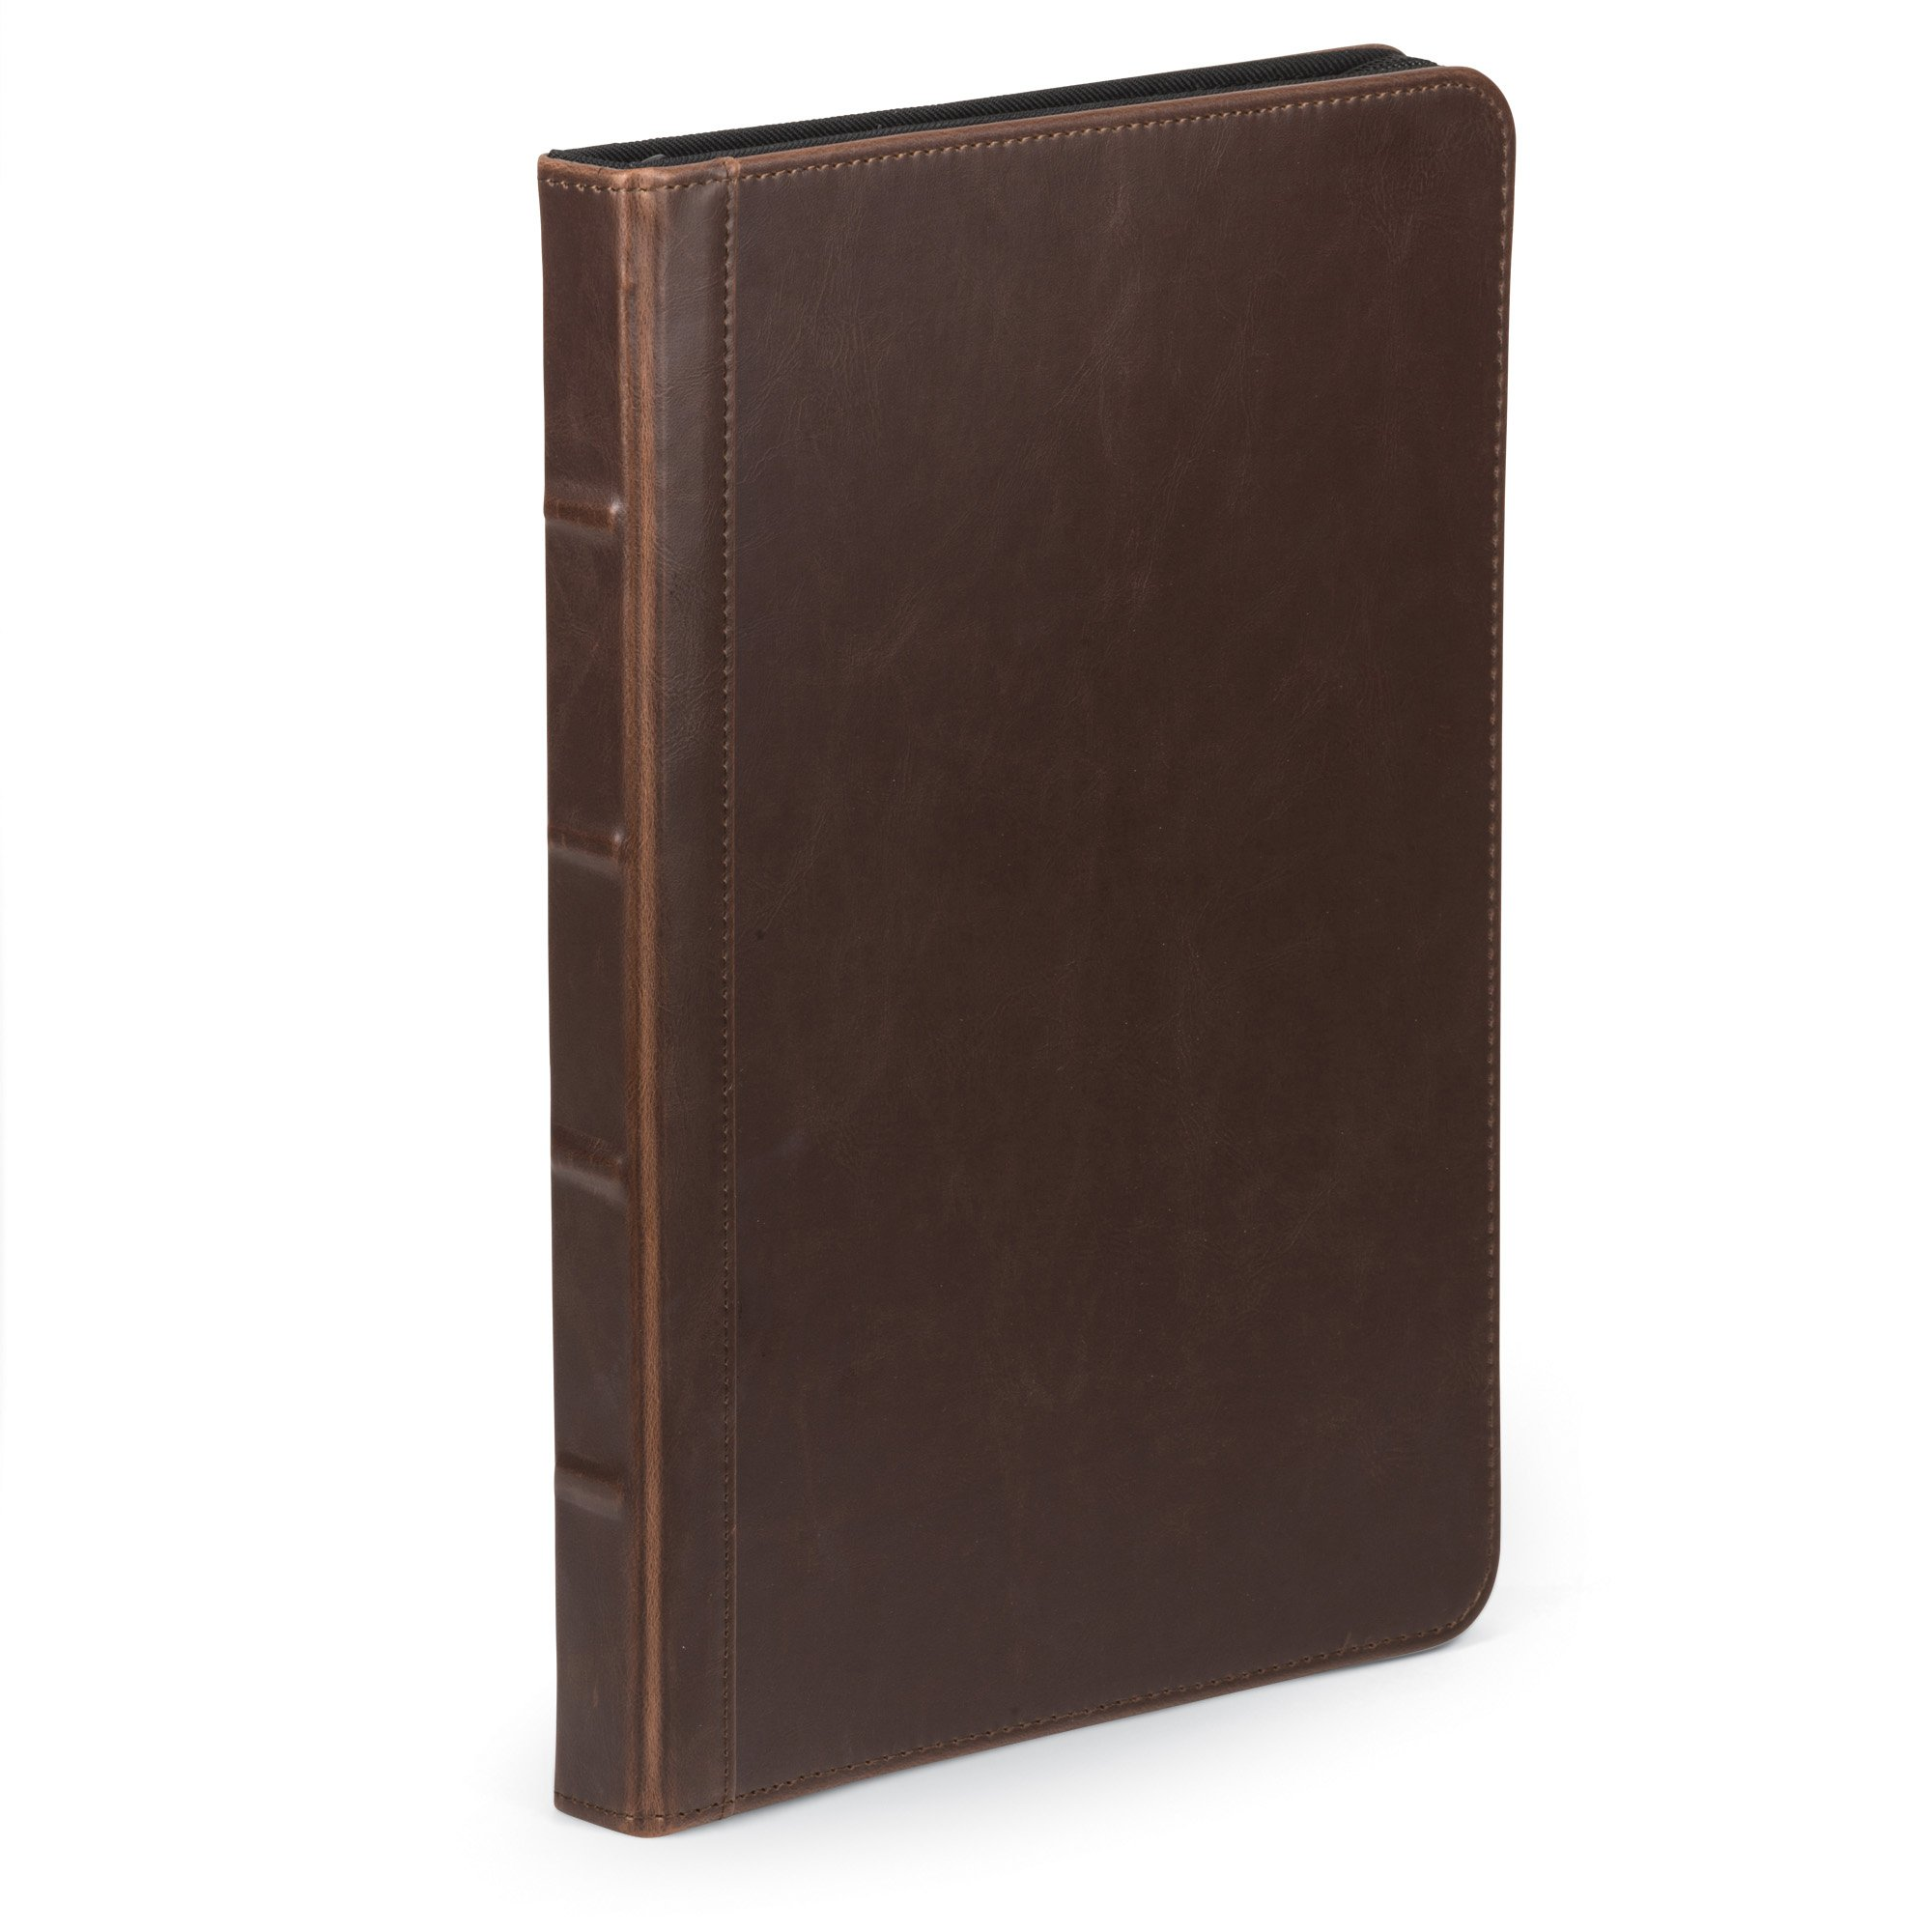 Samsill Vintage Portfolio/Zipper Faux Leather Portfolio, Book Style Hardback Design, Business & Interview Padfolio Organizer, 8.5 x 11 Writing Pad, Dark Brown